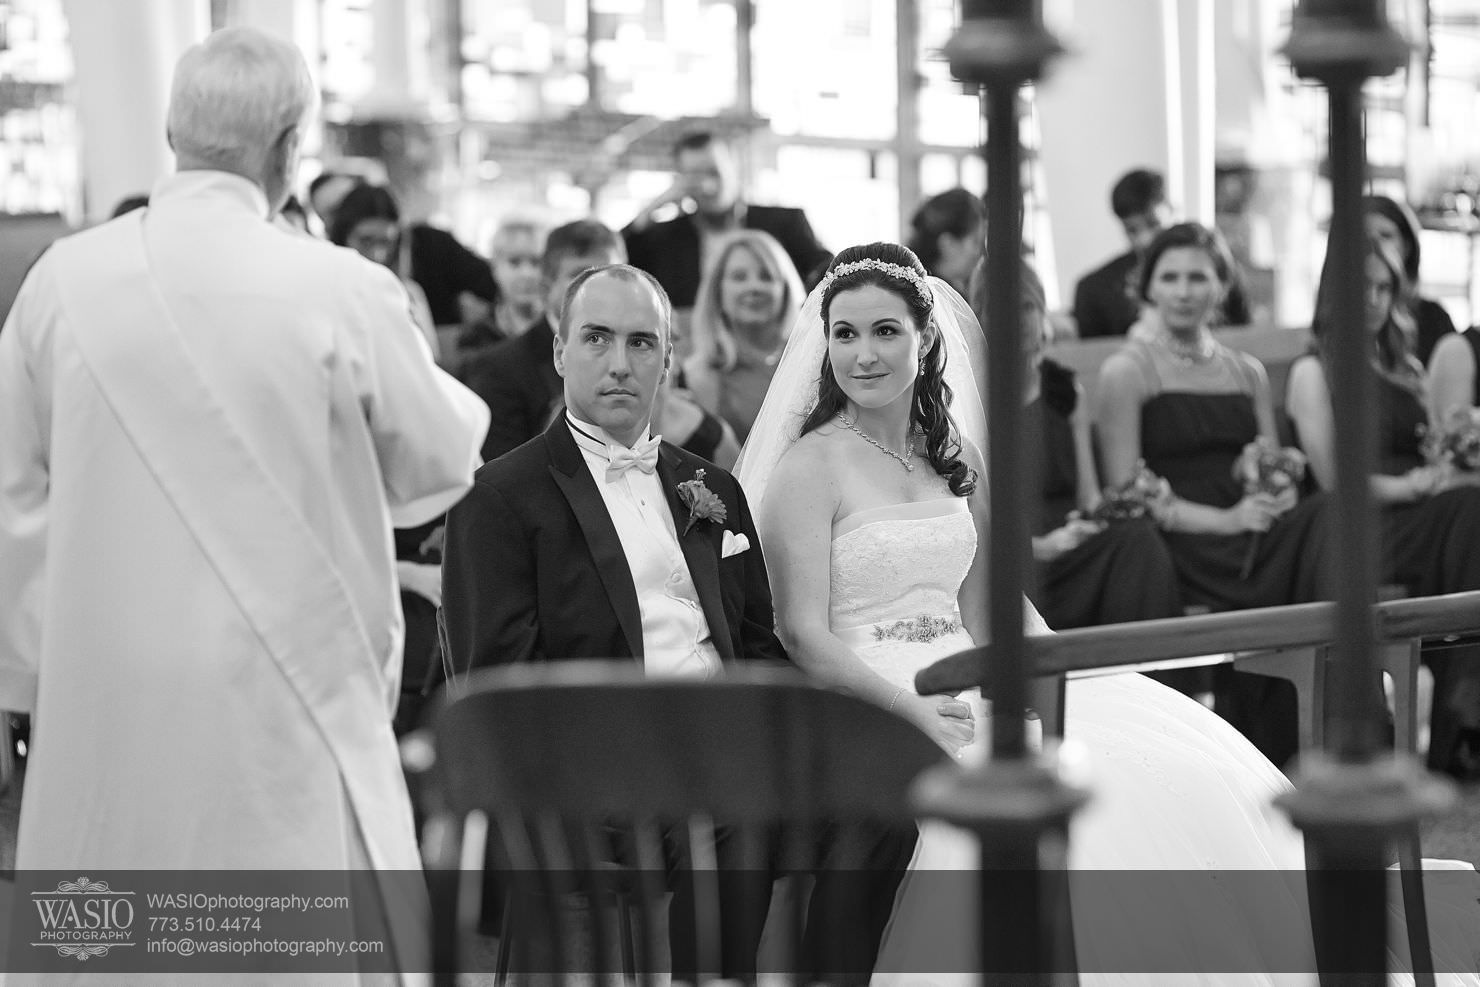 Rosemont-Fall-Wedding-Lauren-and-David-013 Rosemont Fall Wedding - Lauren + David